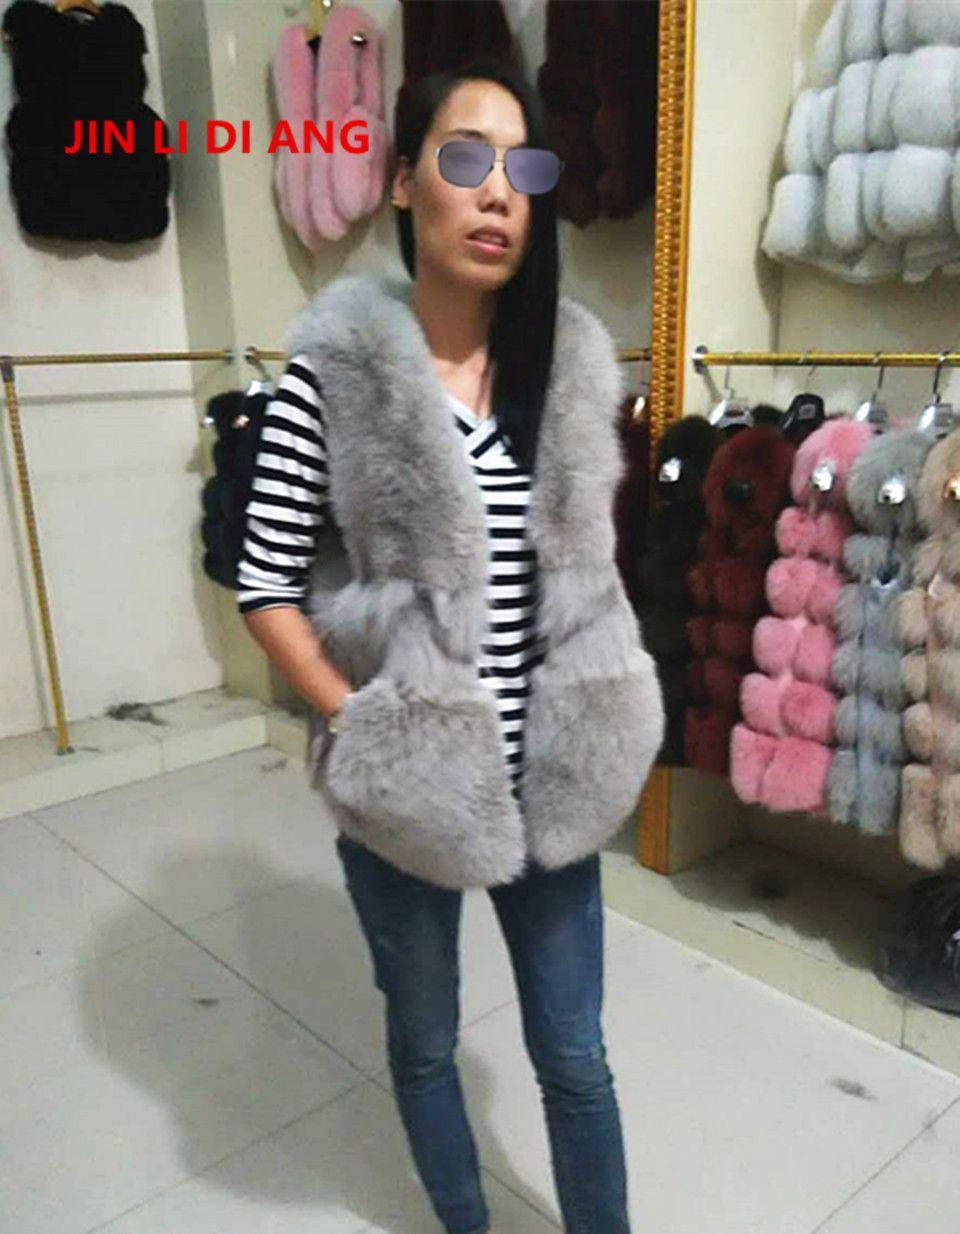 Jin Li Di Ang Real Fox Fur Vest Fashion Slim Vests Low Price Winter Autumn Spring Full Pelt Fox Fur Vintage Vest Jacket